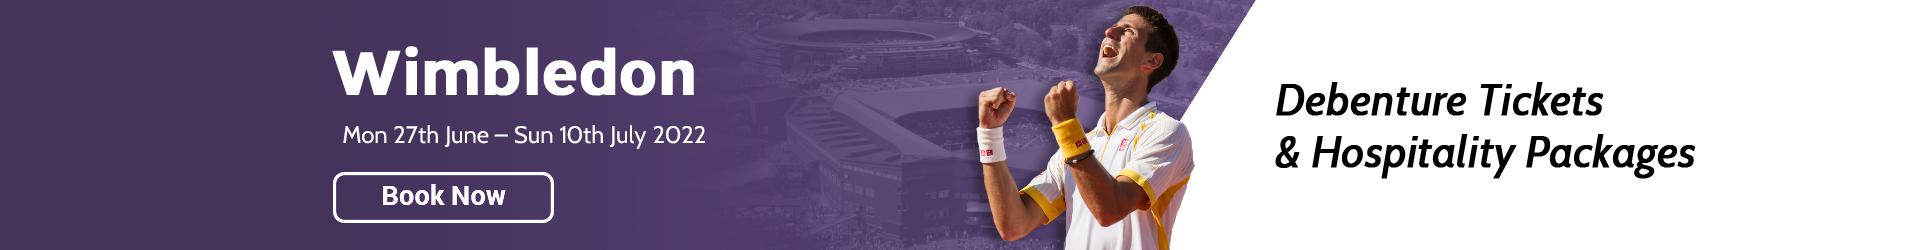 Wimbledon Debenture Hospitality Banner 2022